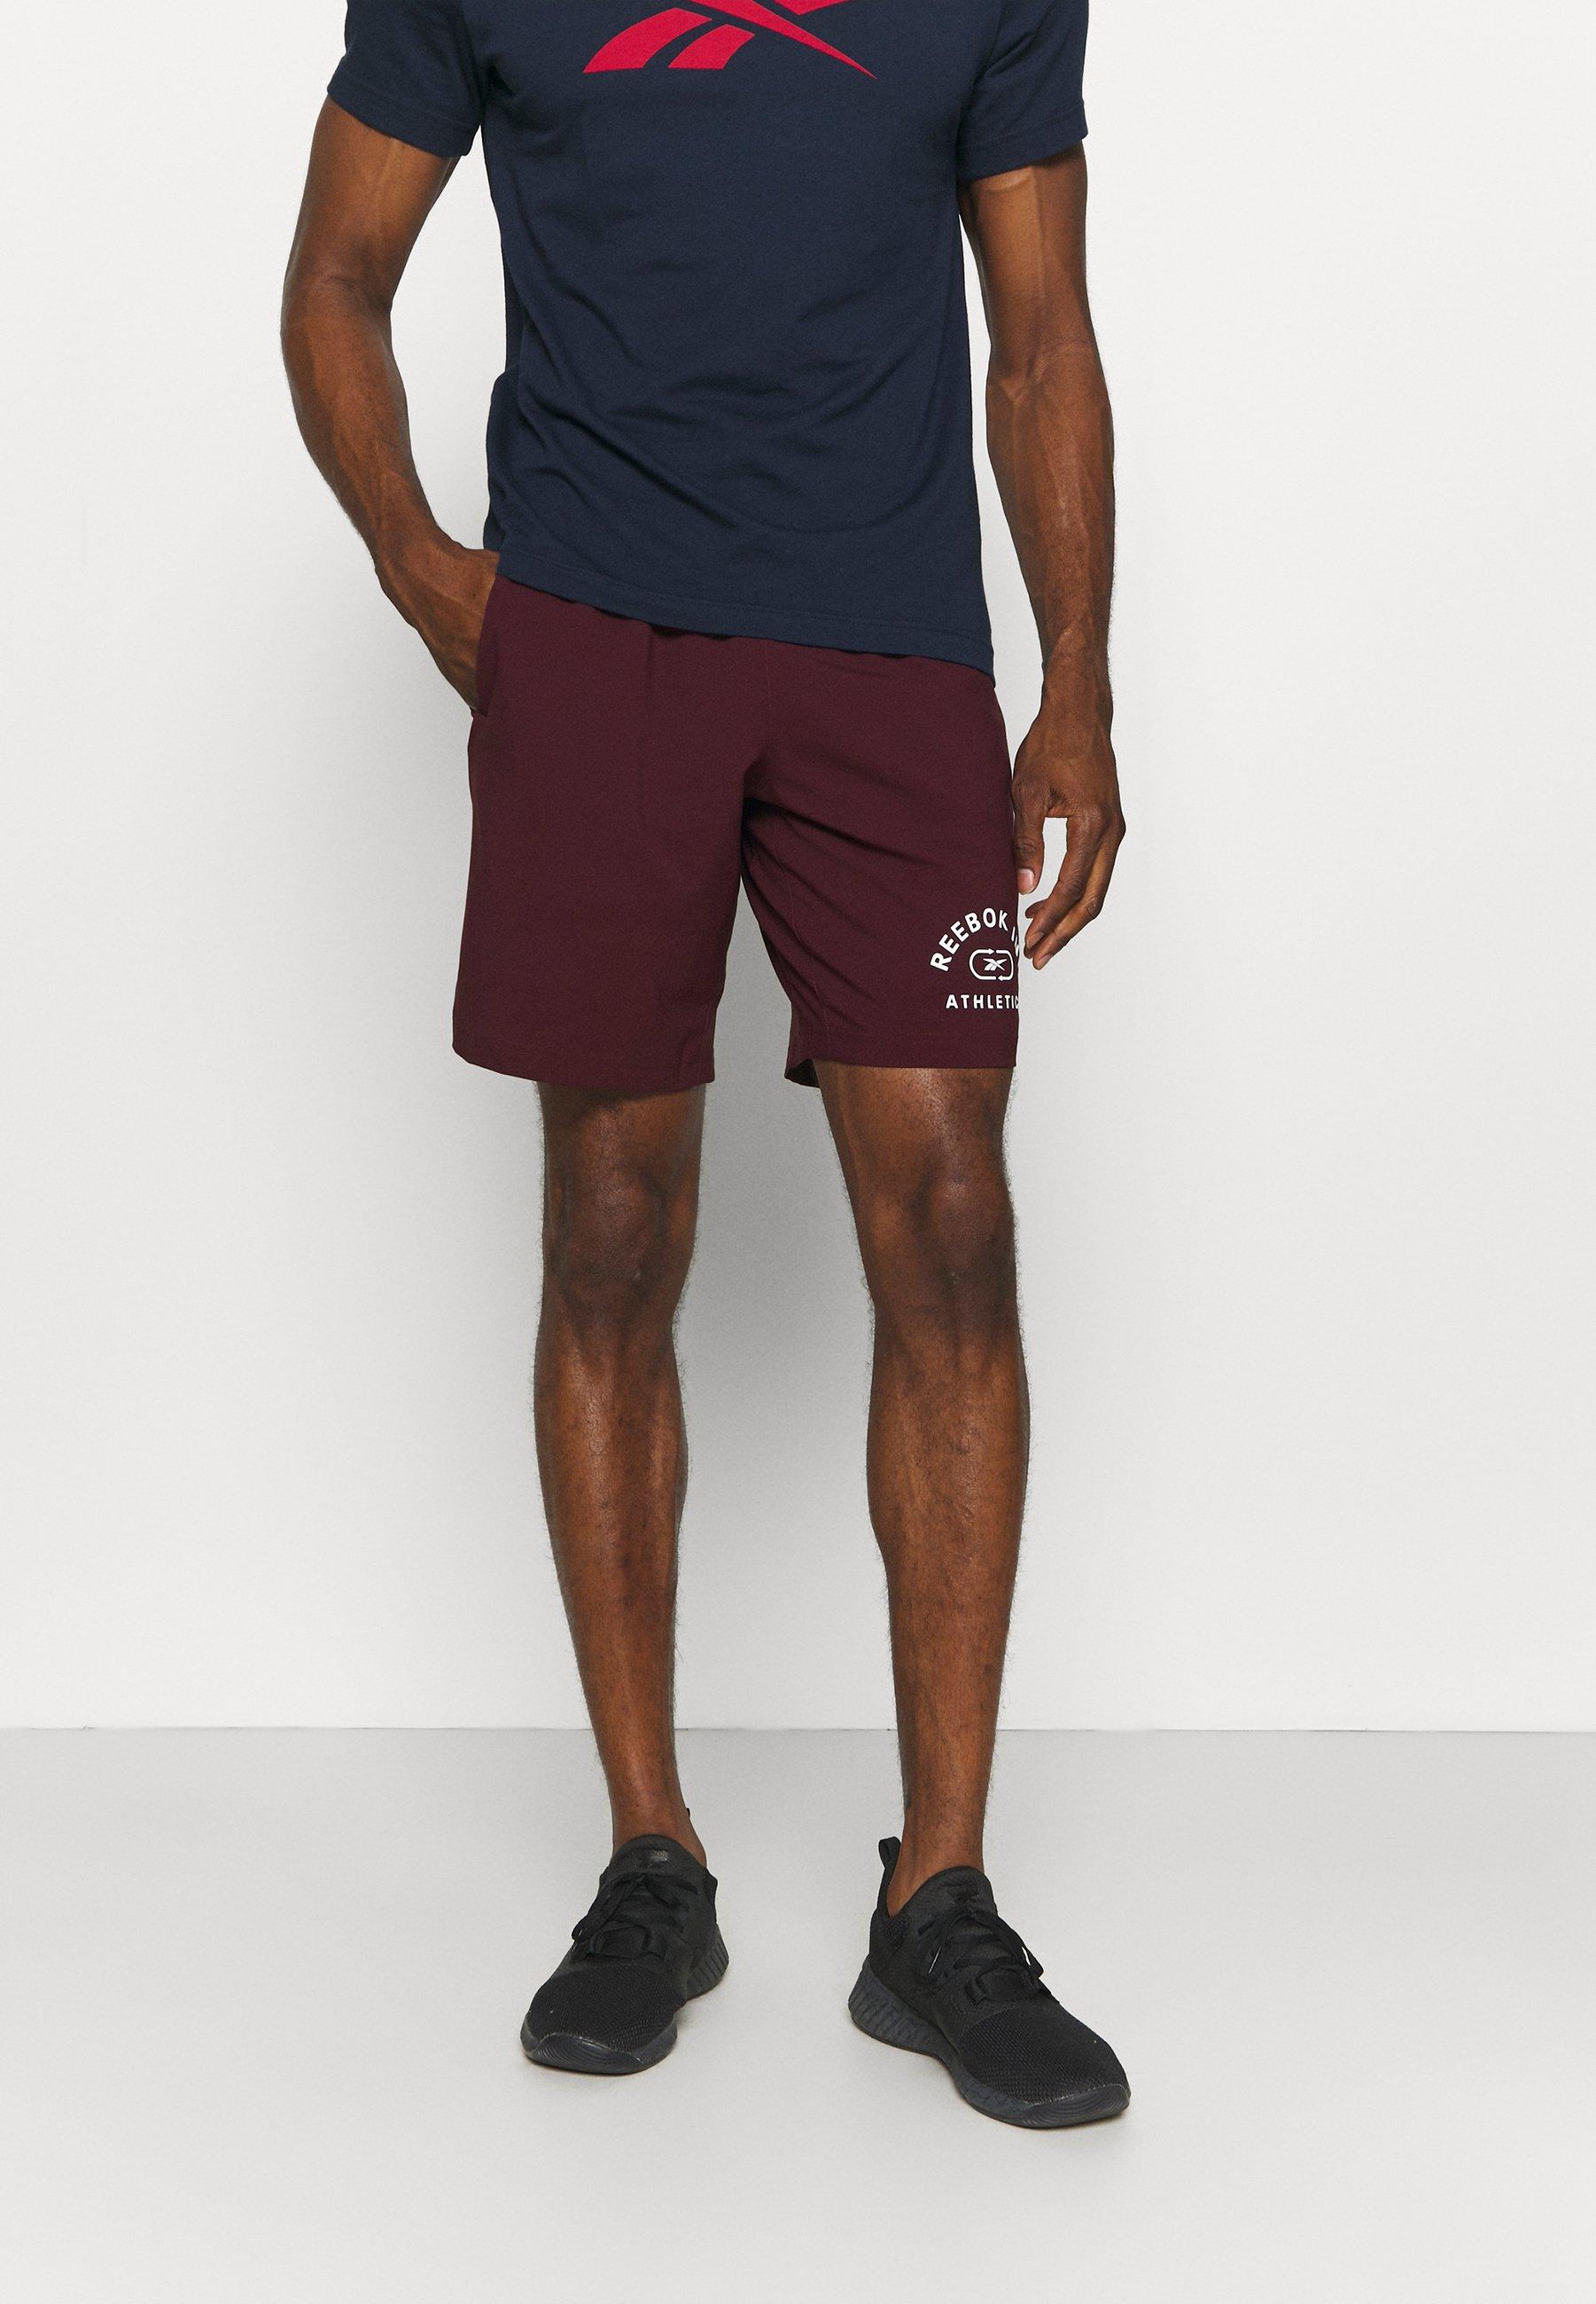 Herren GRAPHIC SHORT - kurze Sporthose